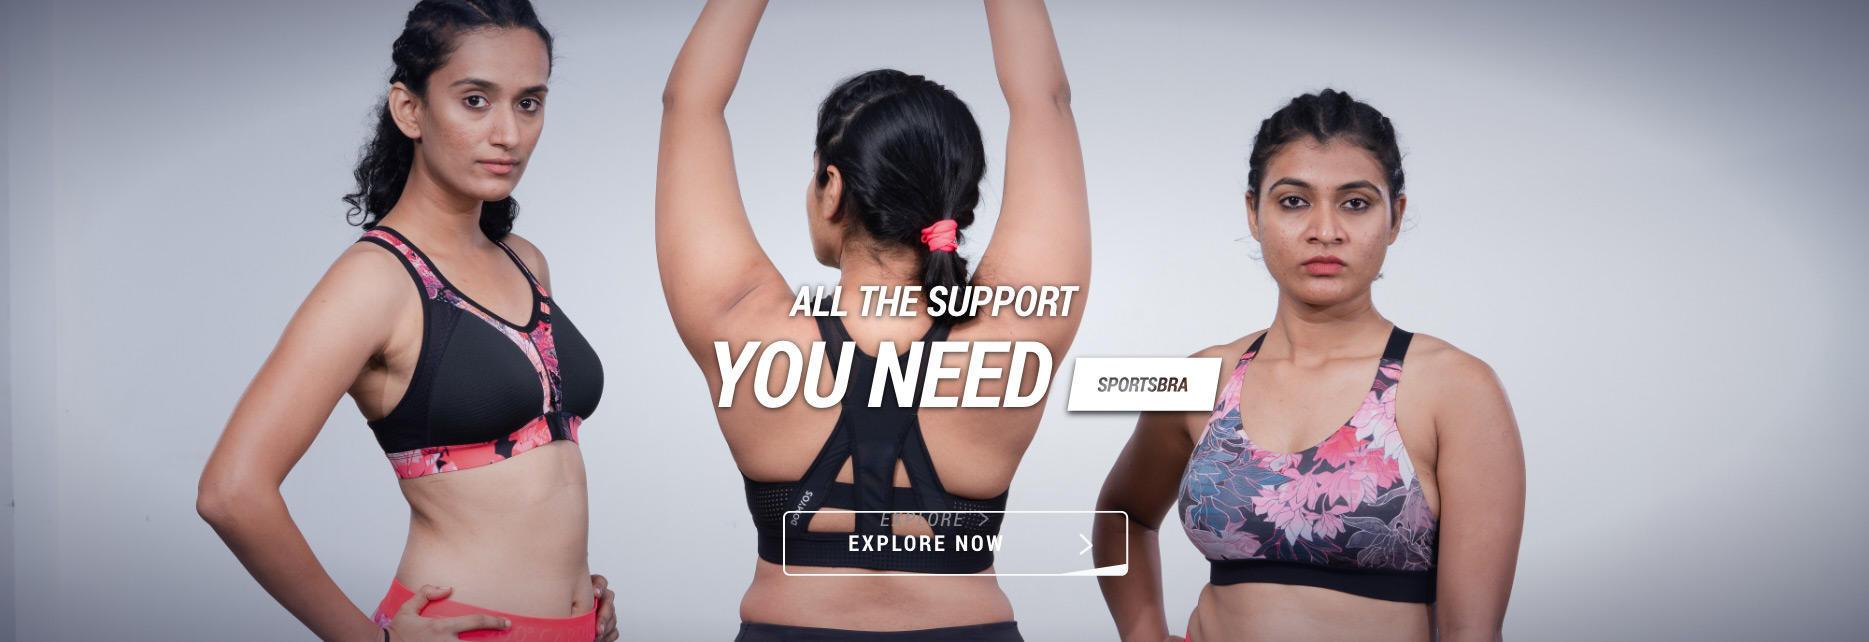 Women Sports Bra, Decathlon fitness bra